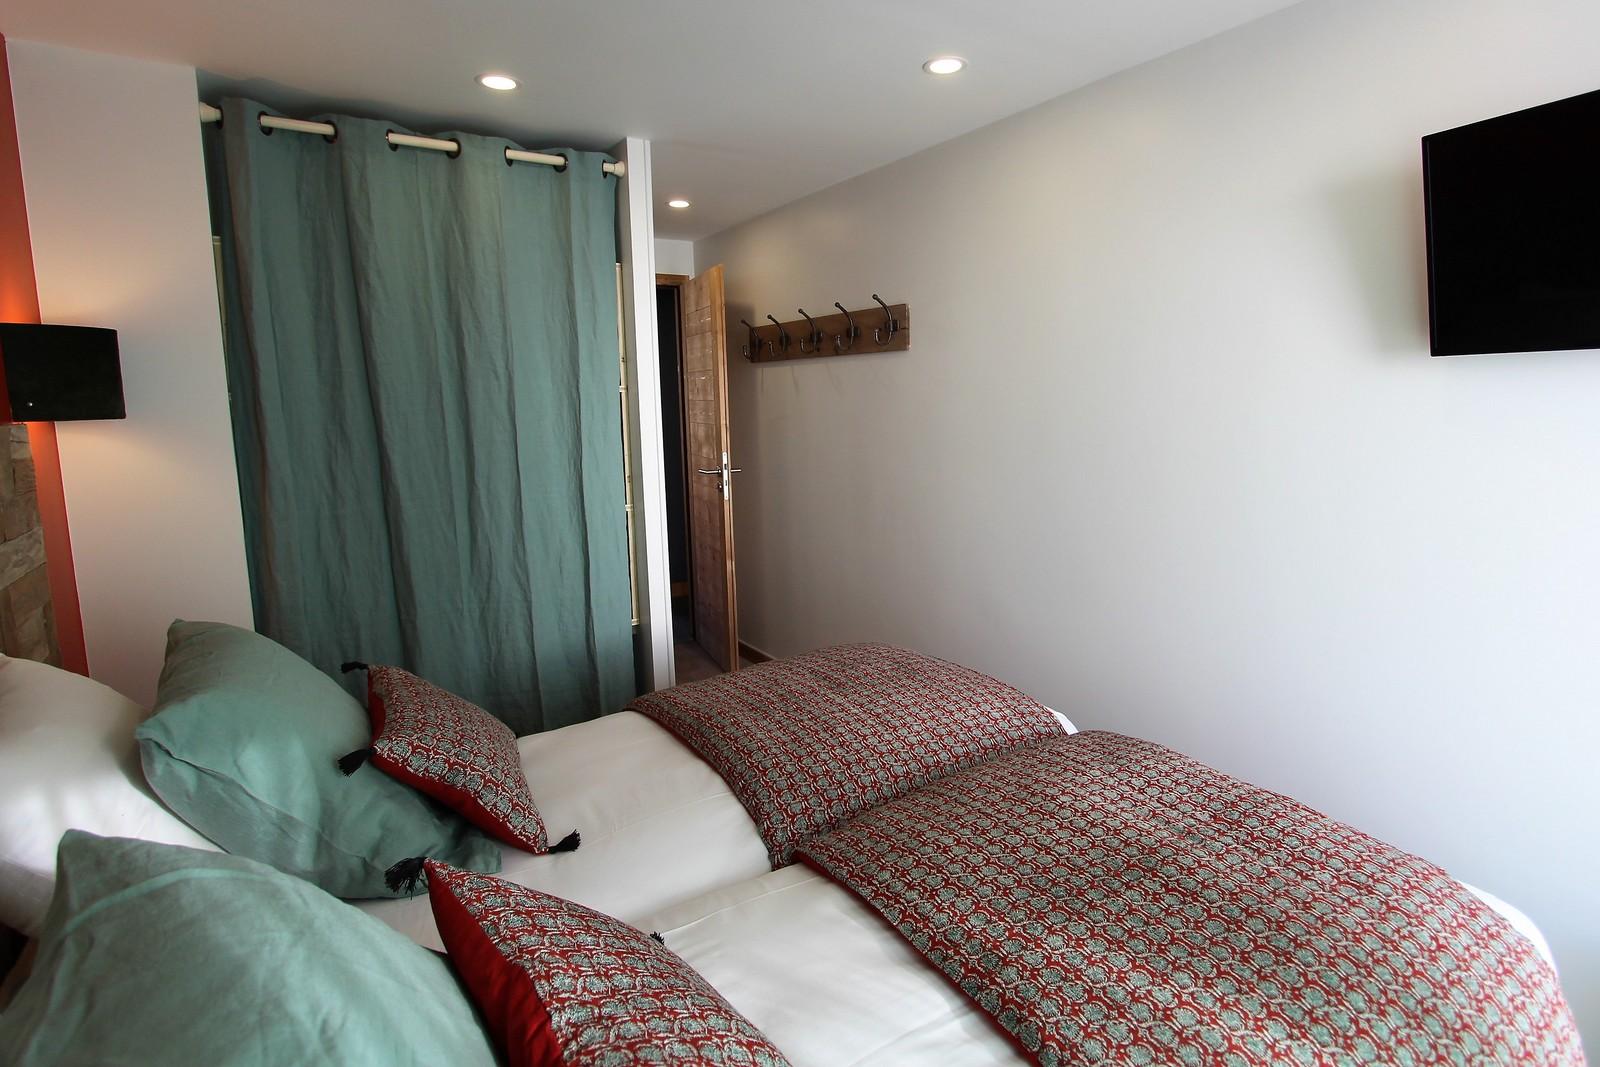 chambre tv confortable salle de bain individuelle